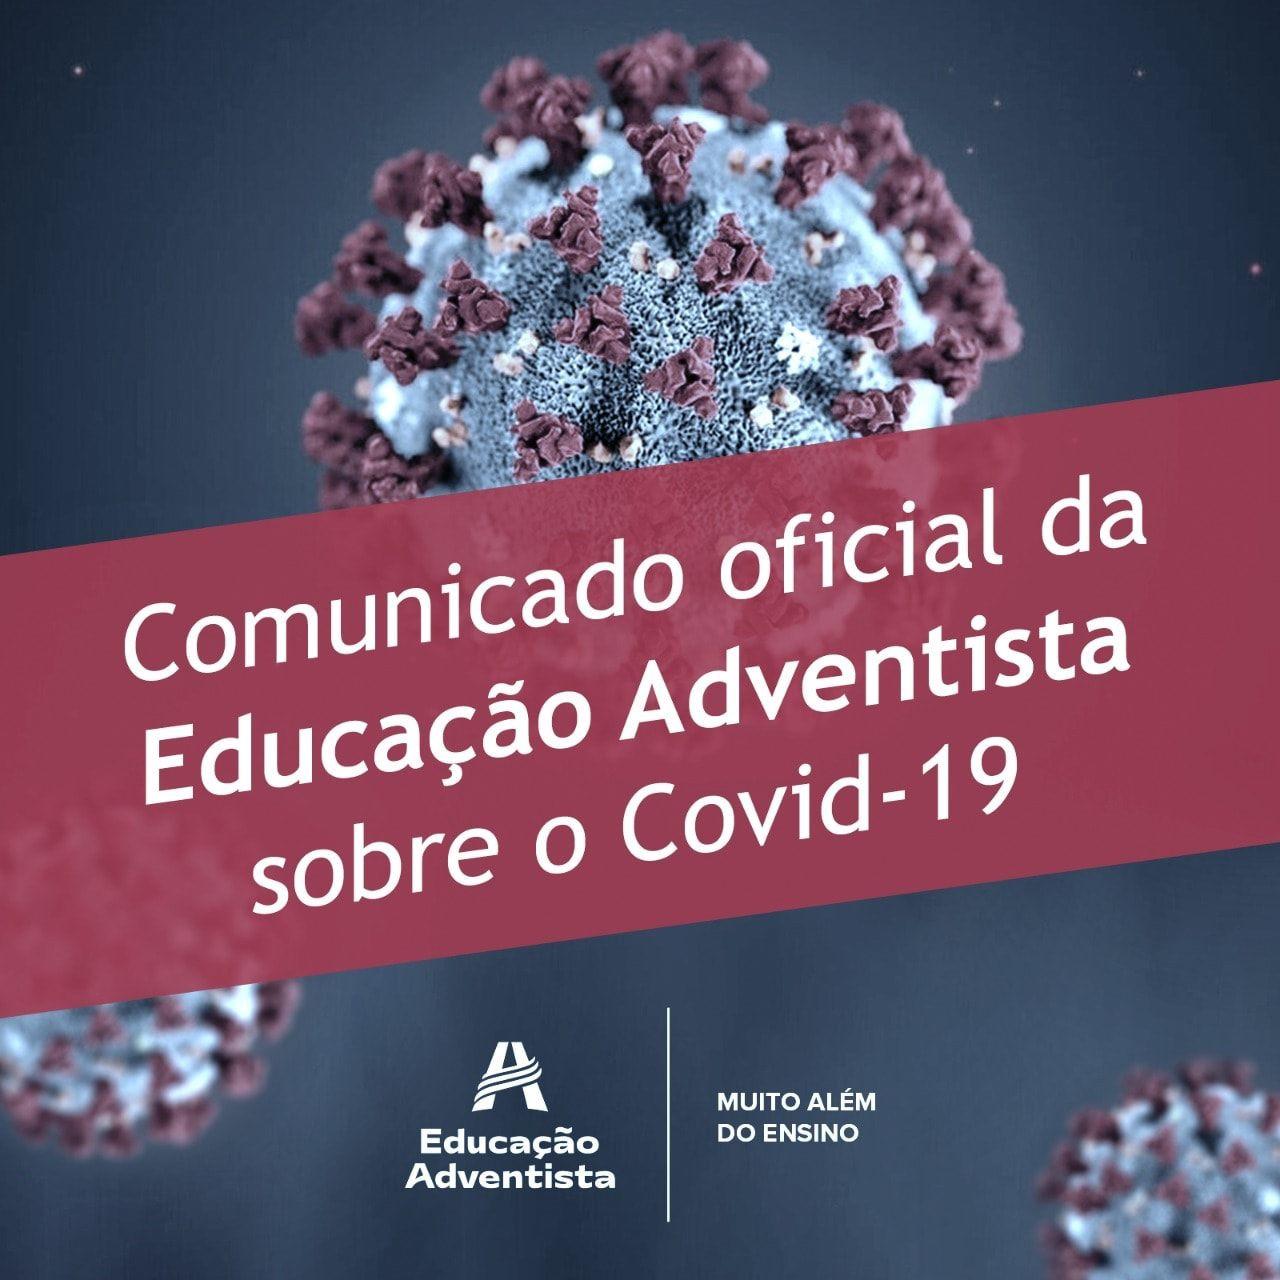 Corona Vírus (Covid-19) - Informações Importantes